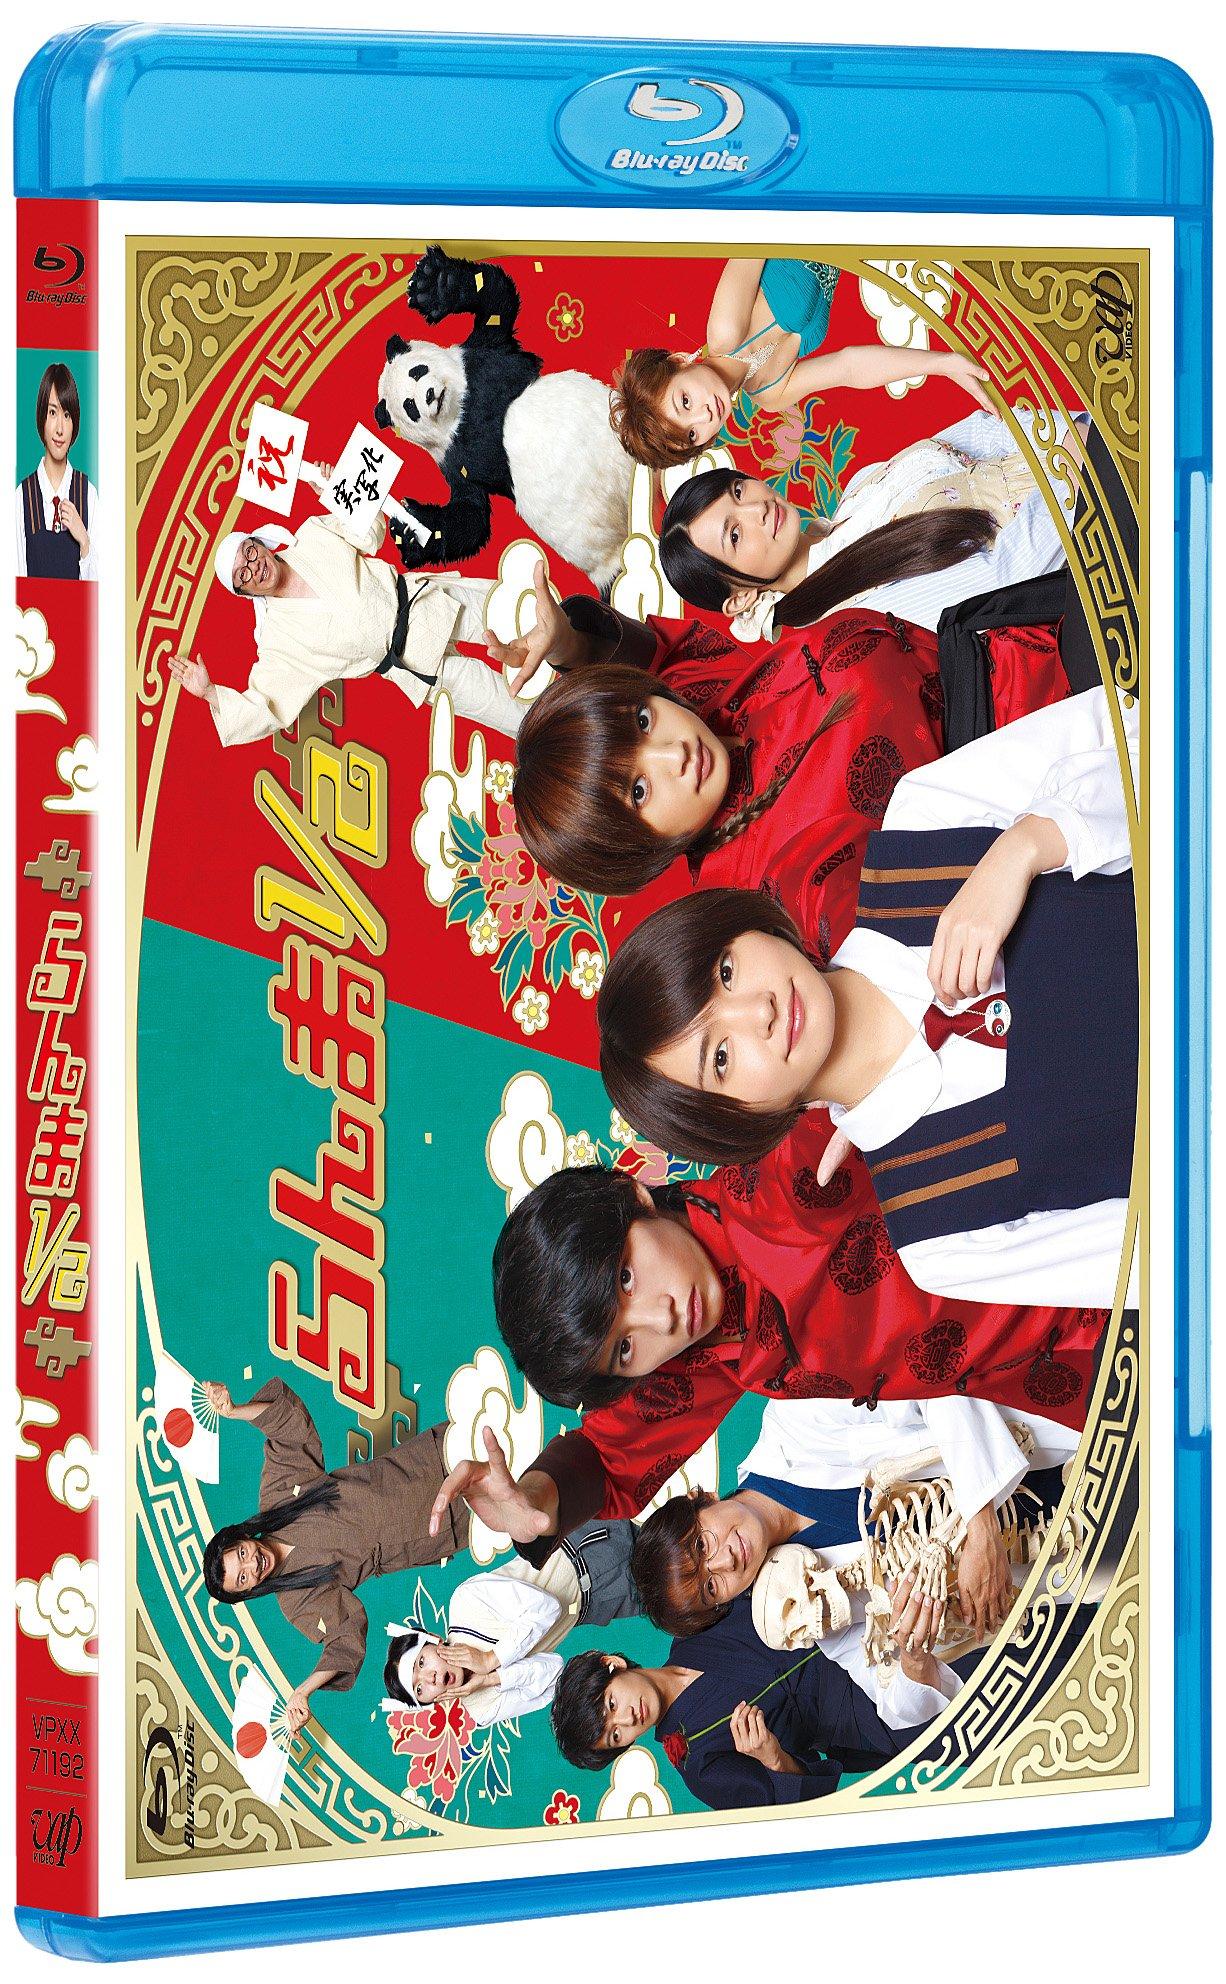 Ranma 1/2 (Live Action TV Drama) Blu-ray Disc ...